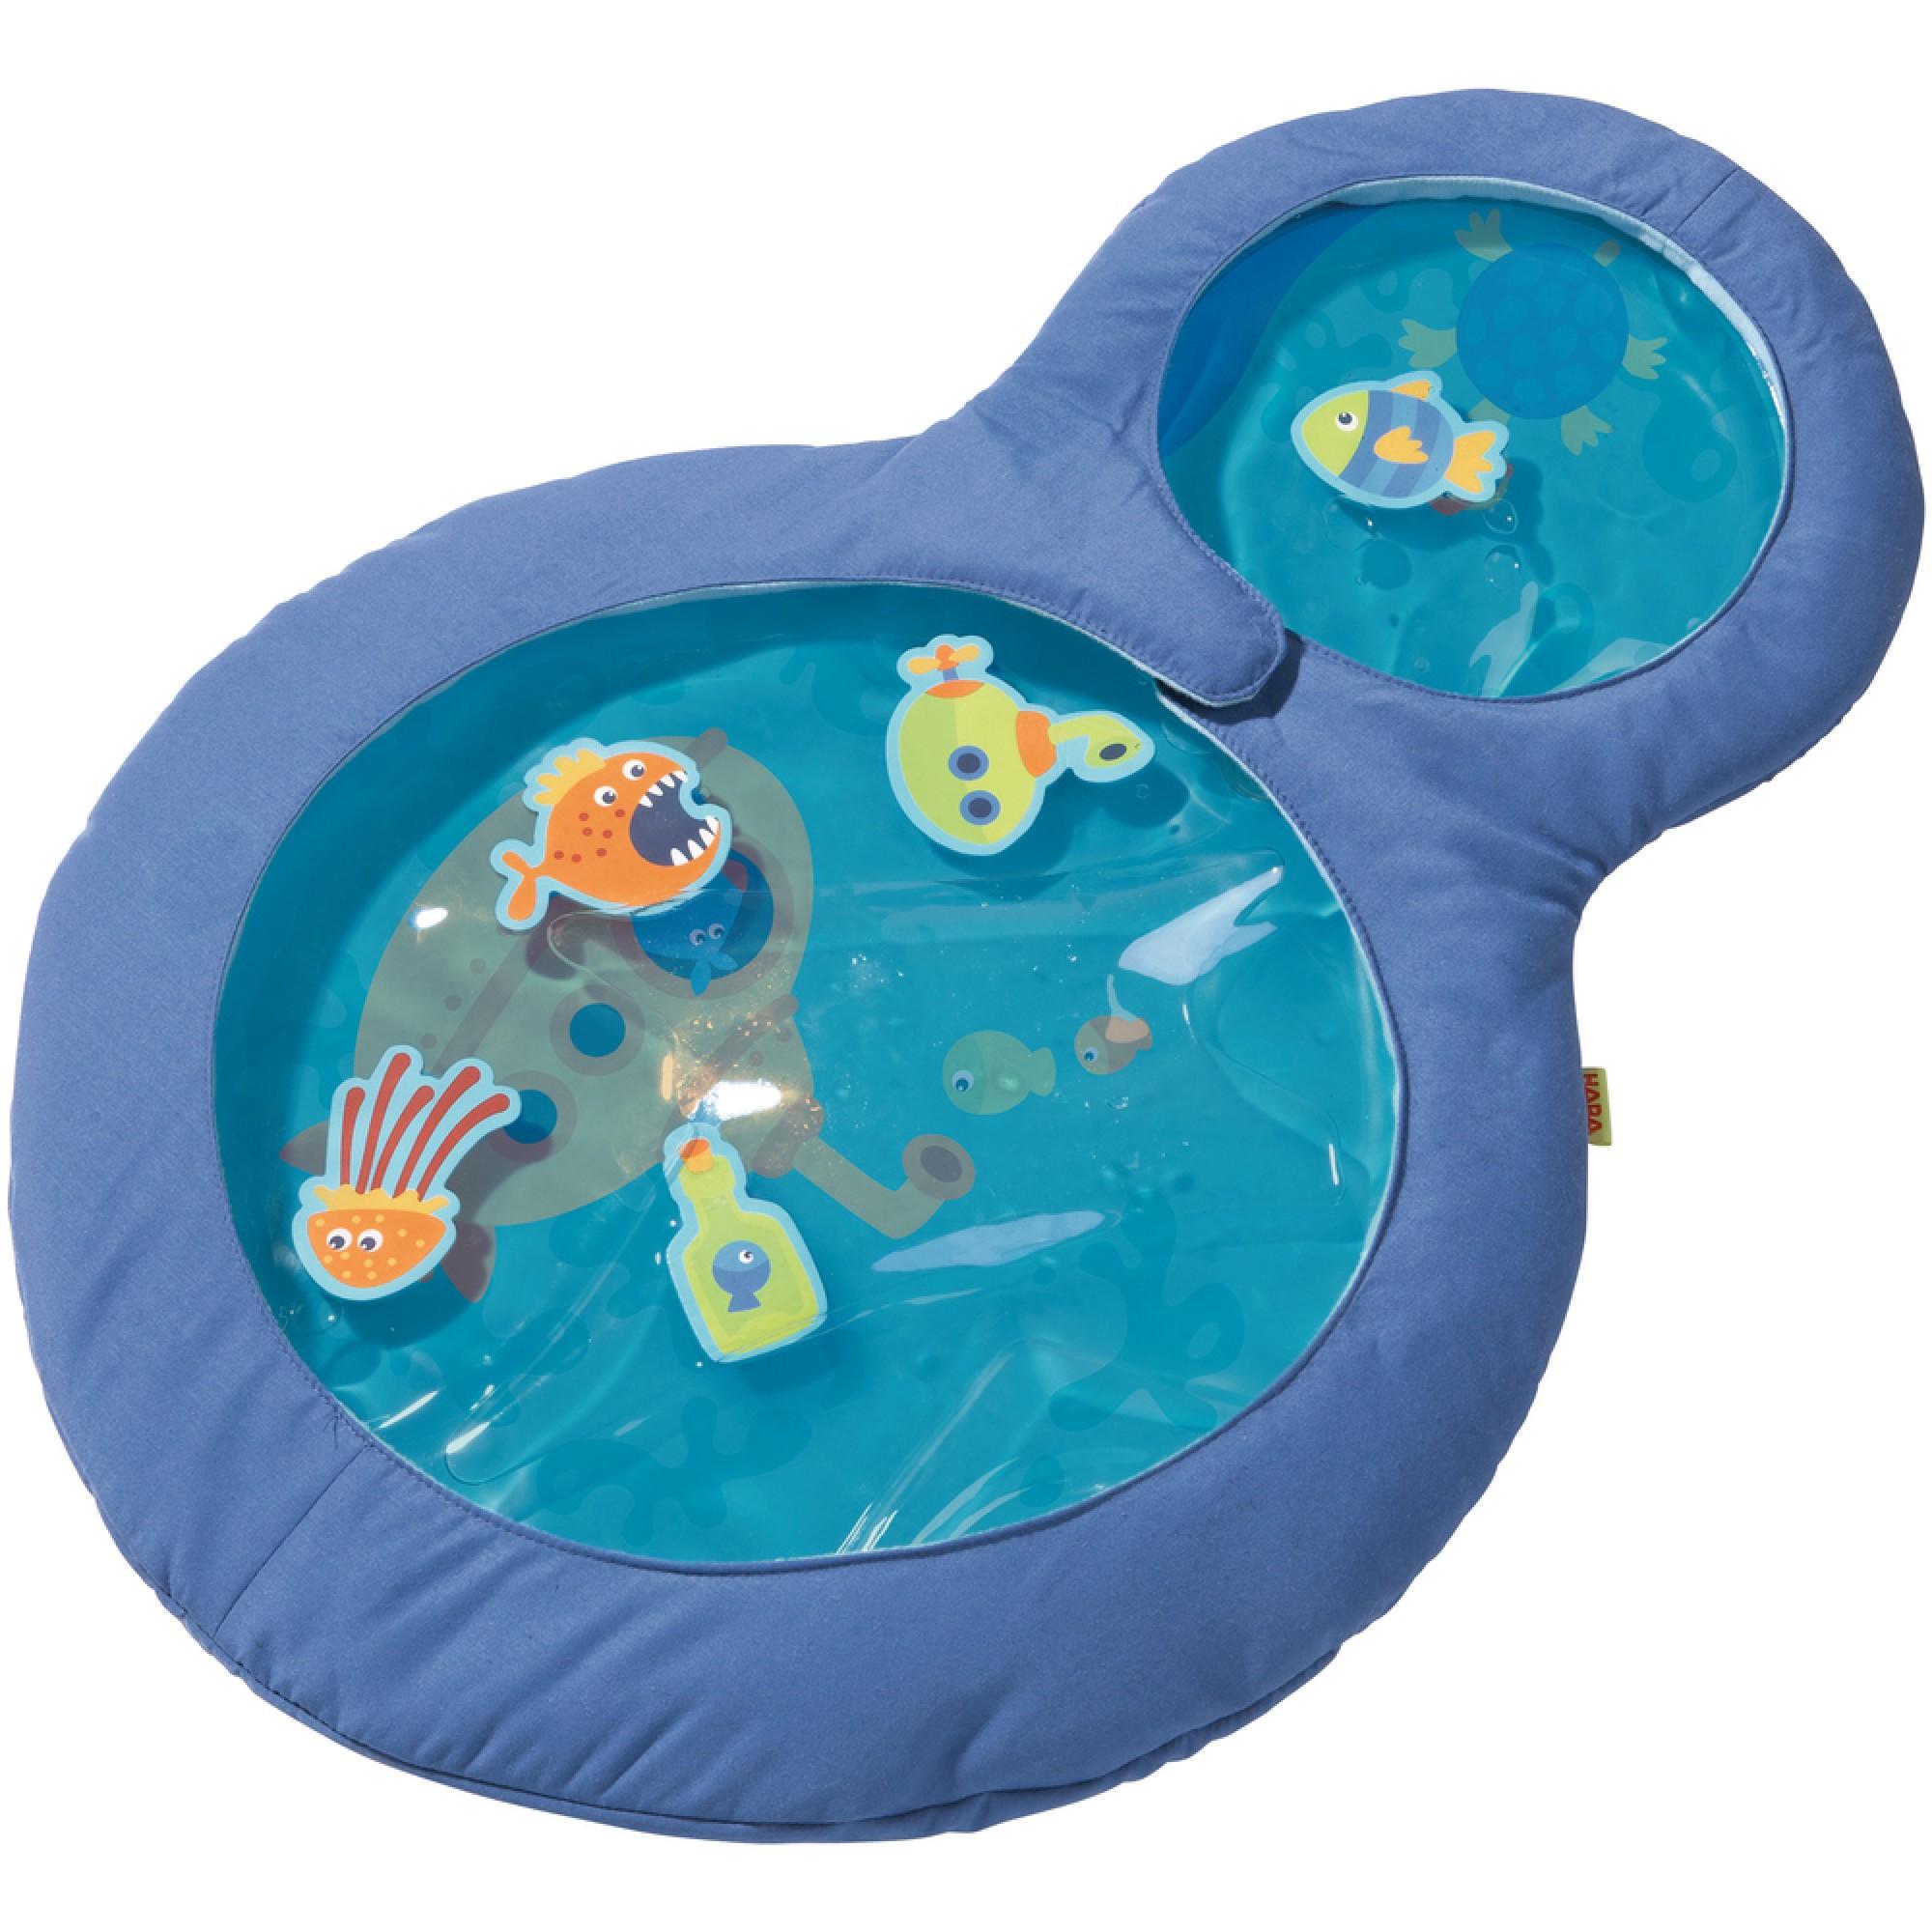 Loc de joaca cu apa, Haba, Micii scafandri, 6luni+